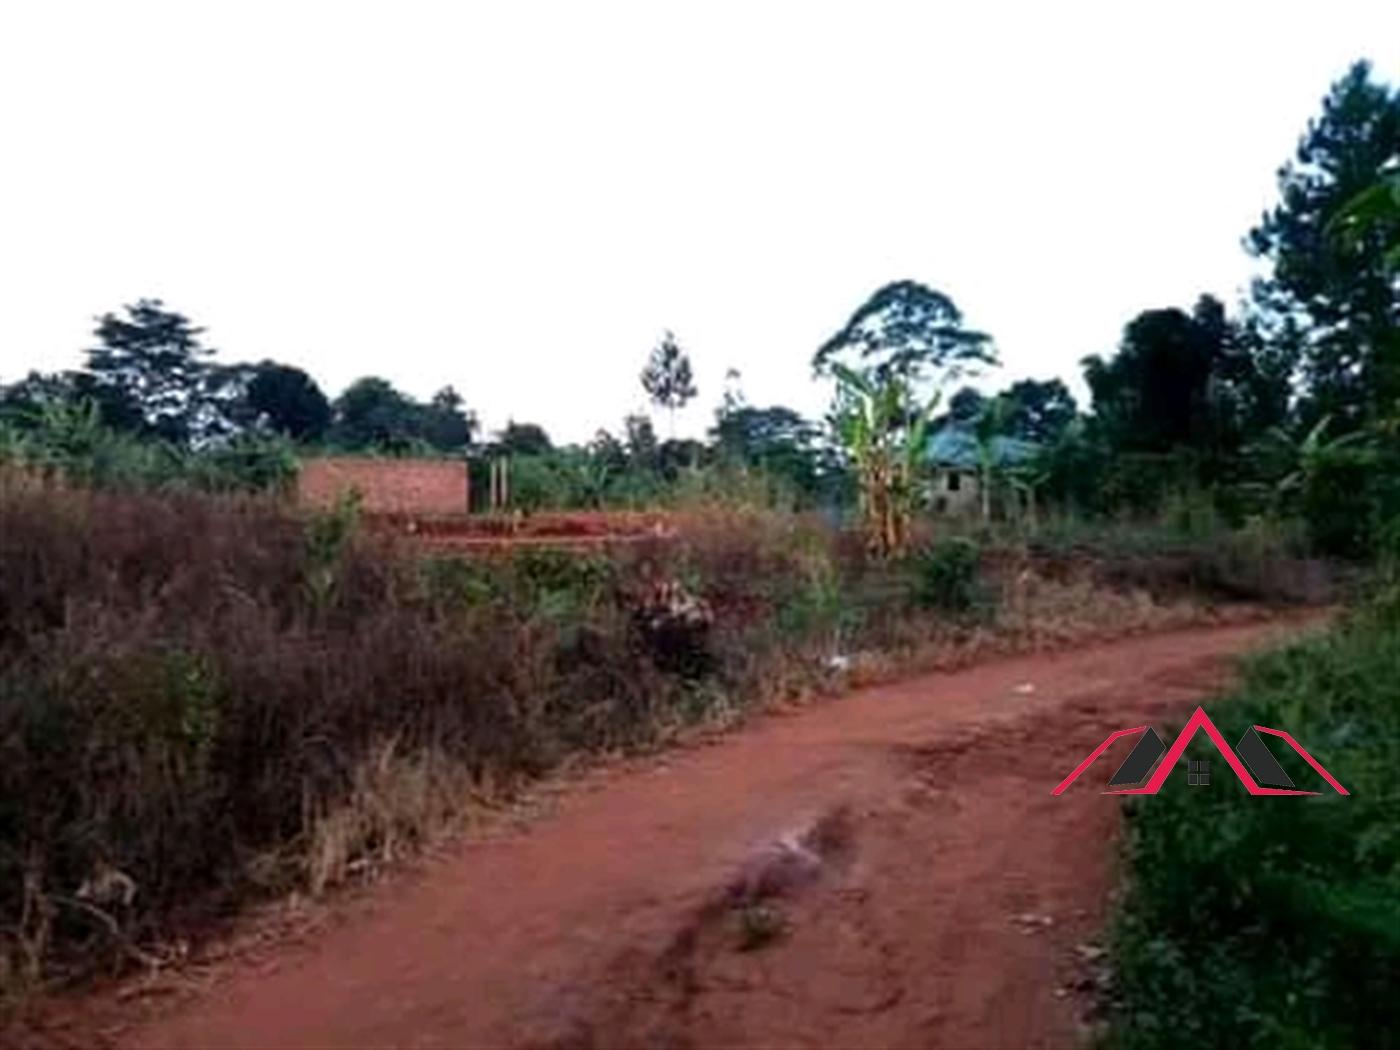 Residential Land for sale in Nakifuma Wakiso